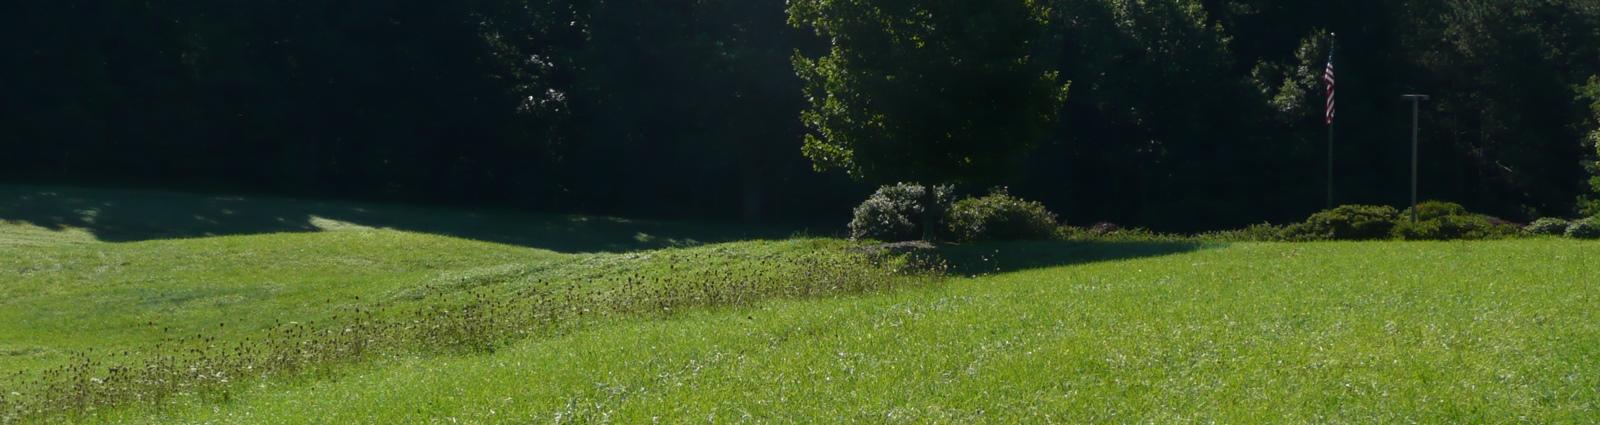 field-next-to-flpc-driveway-crop